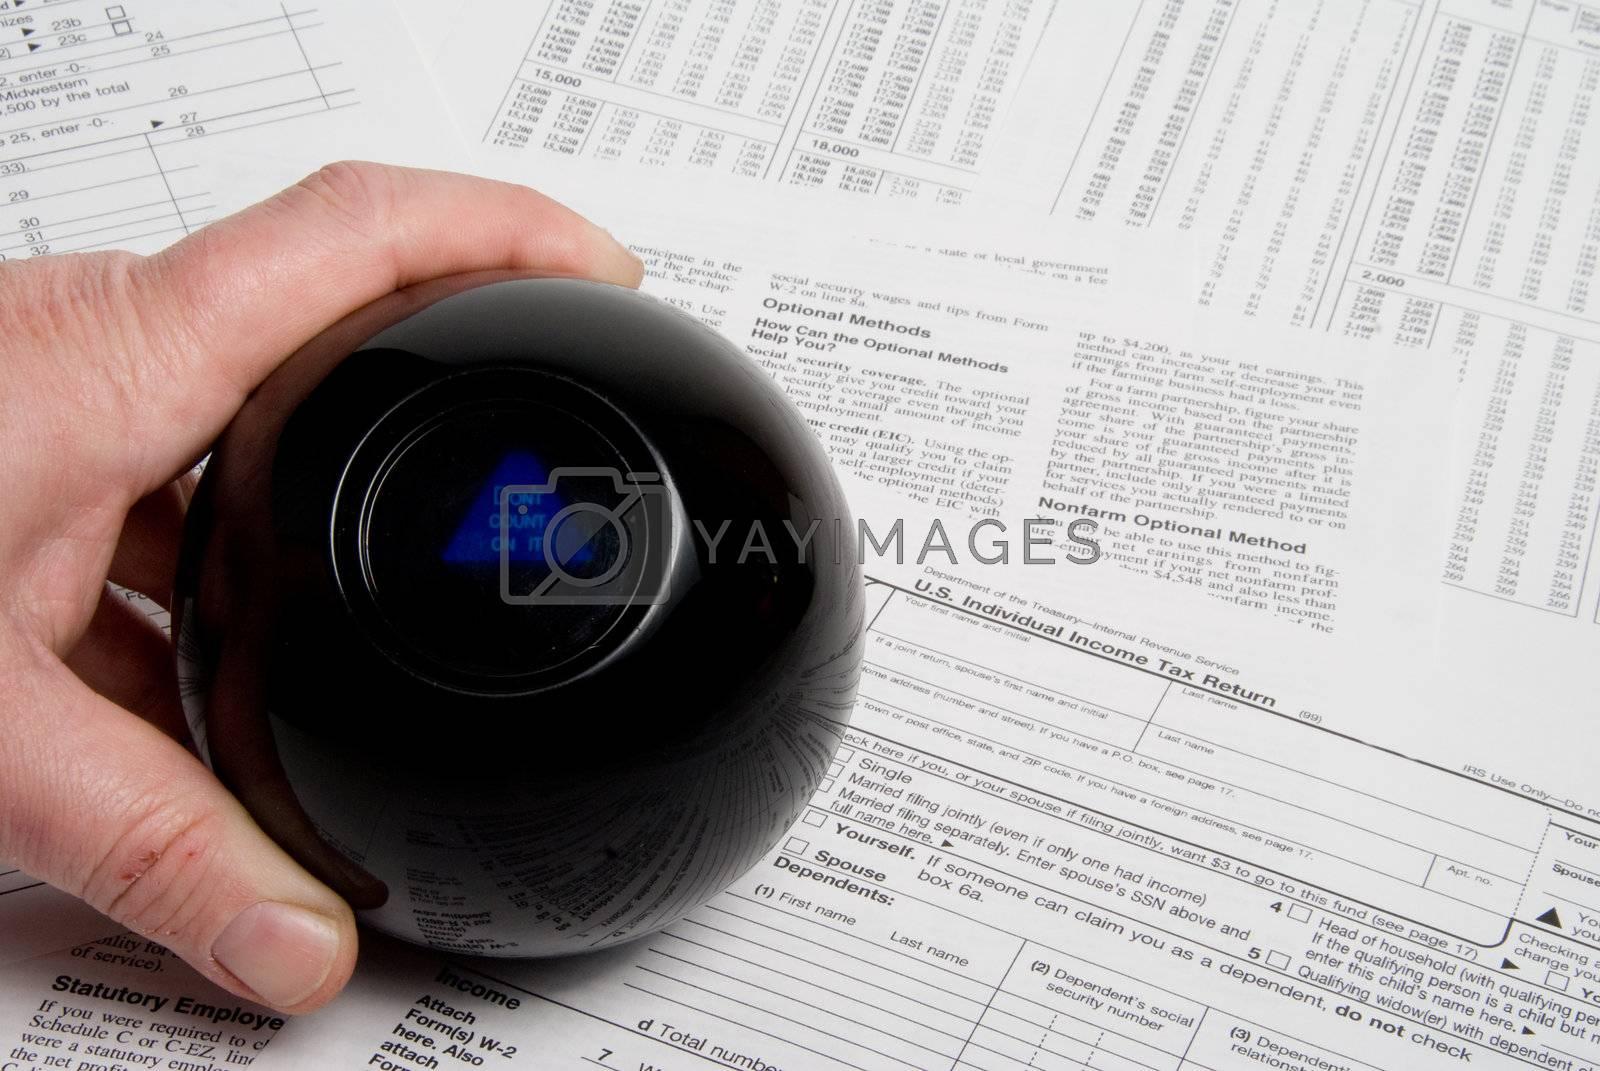 Using a magic ball to predict an incom tax outcome.